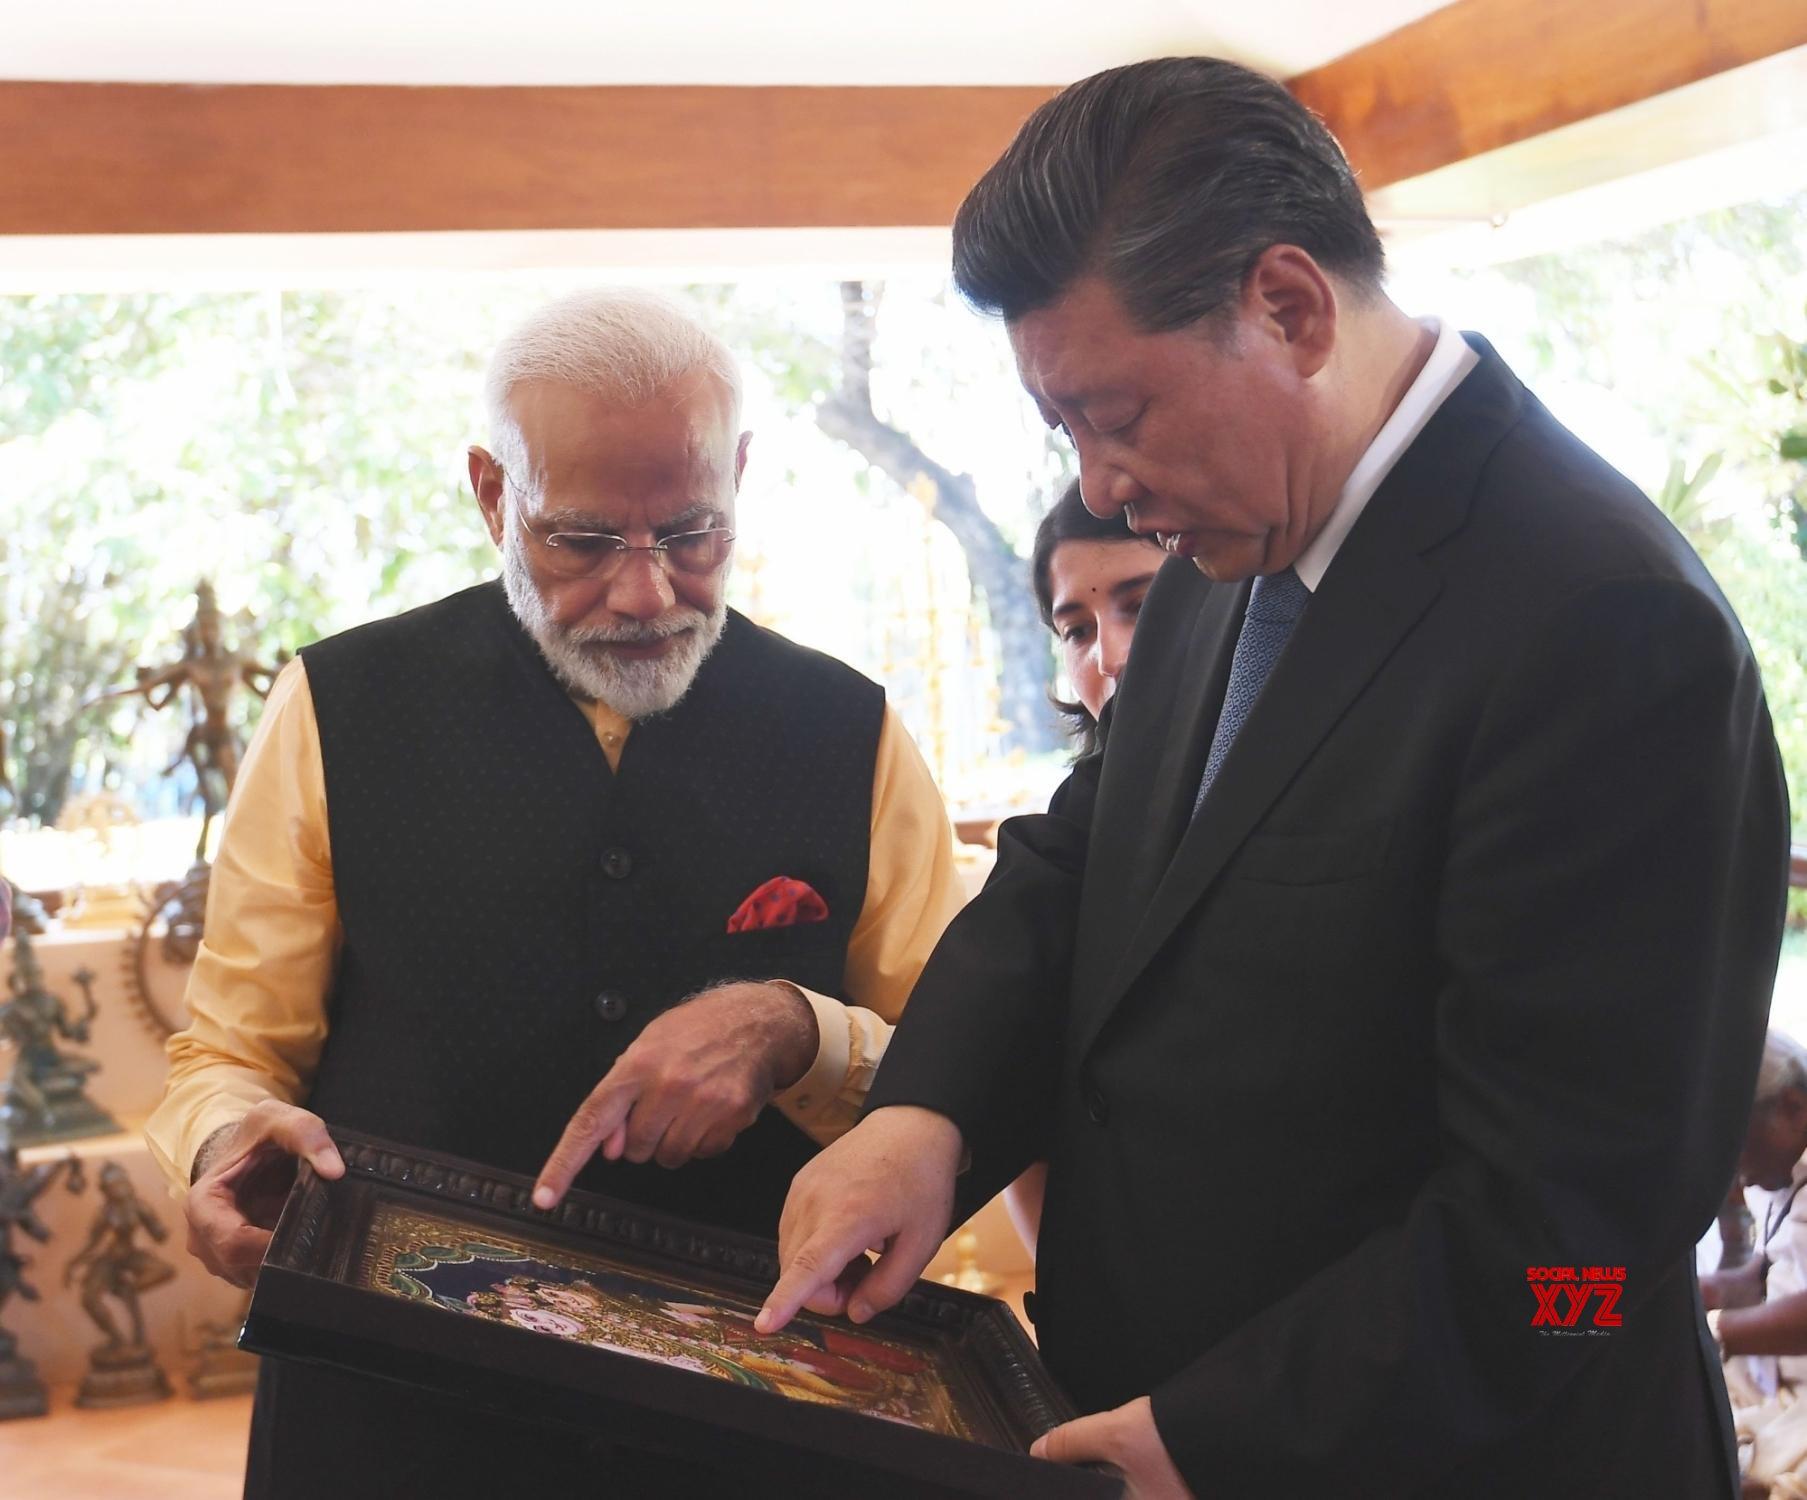 Mahabalipuram: PM Modi, Chinese President exchange gifts on 2nd day of Informal Summit #Gallery